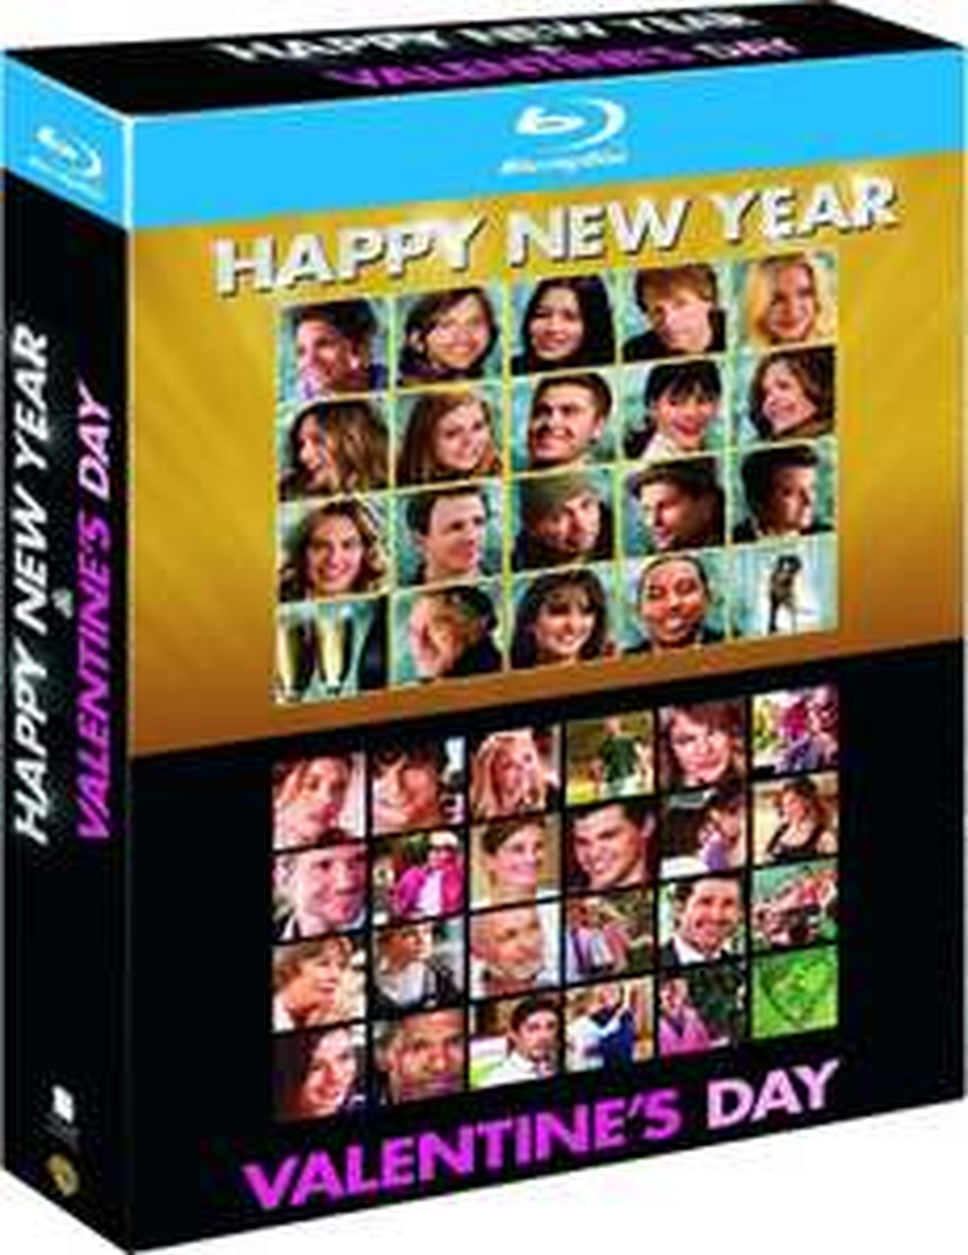 Coffret Blu-ray Happy New Year + Valentine's Day